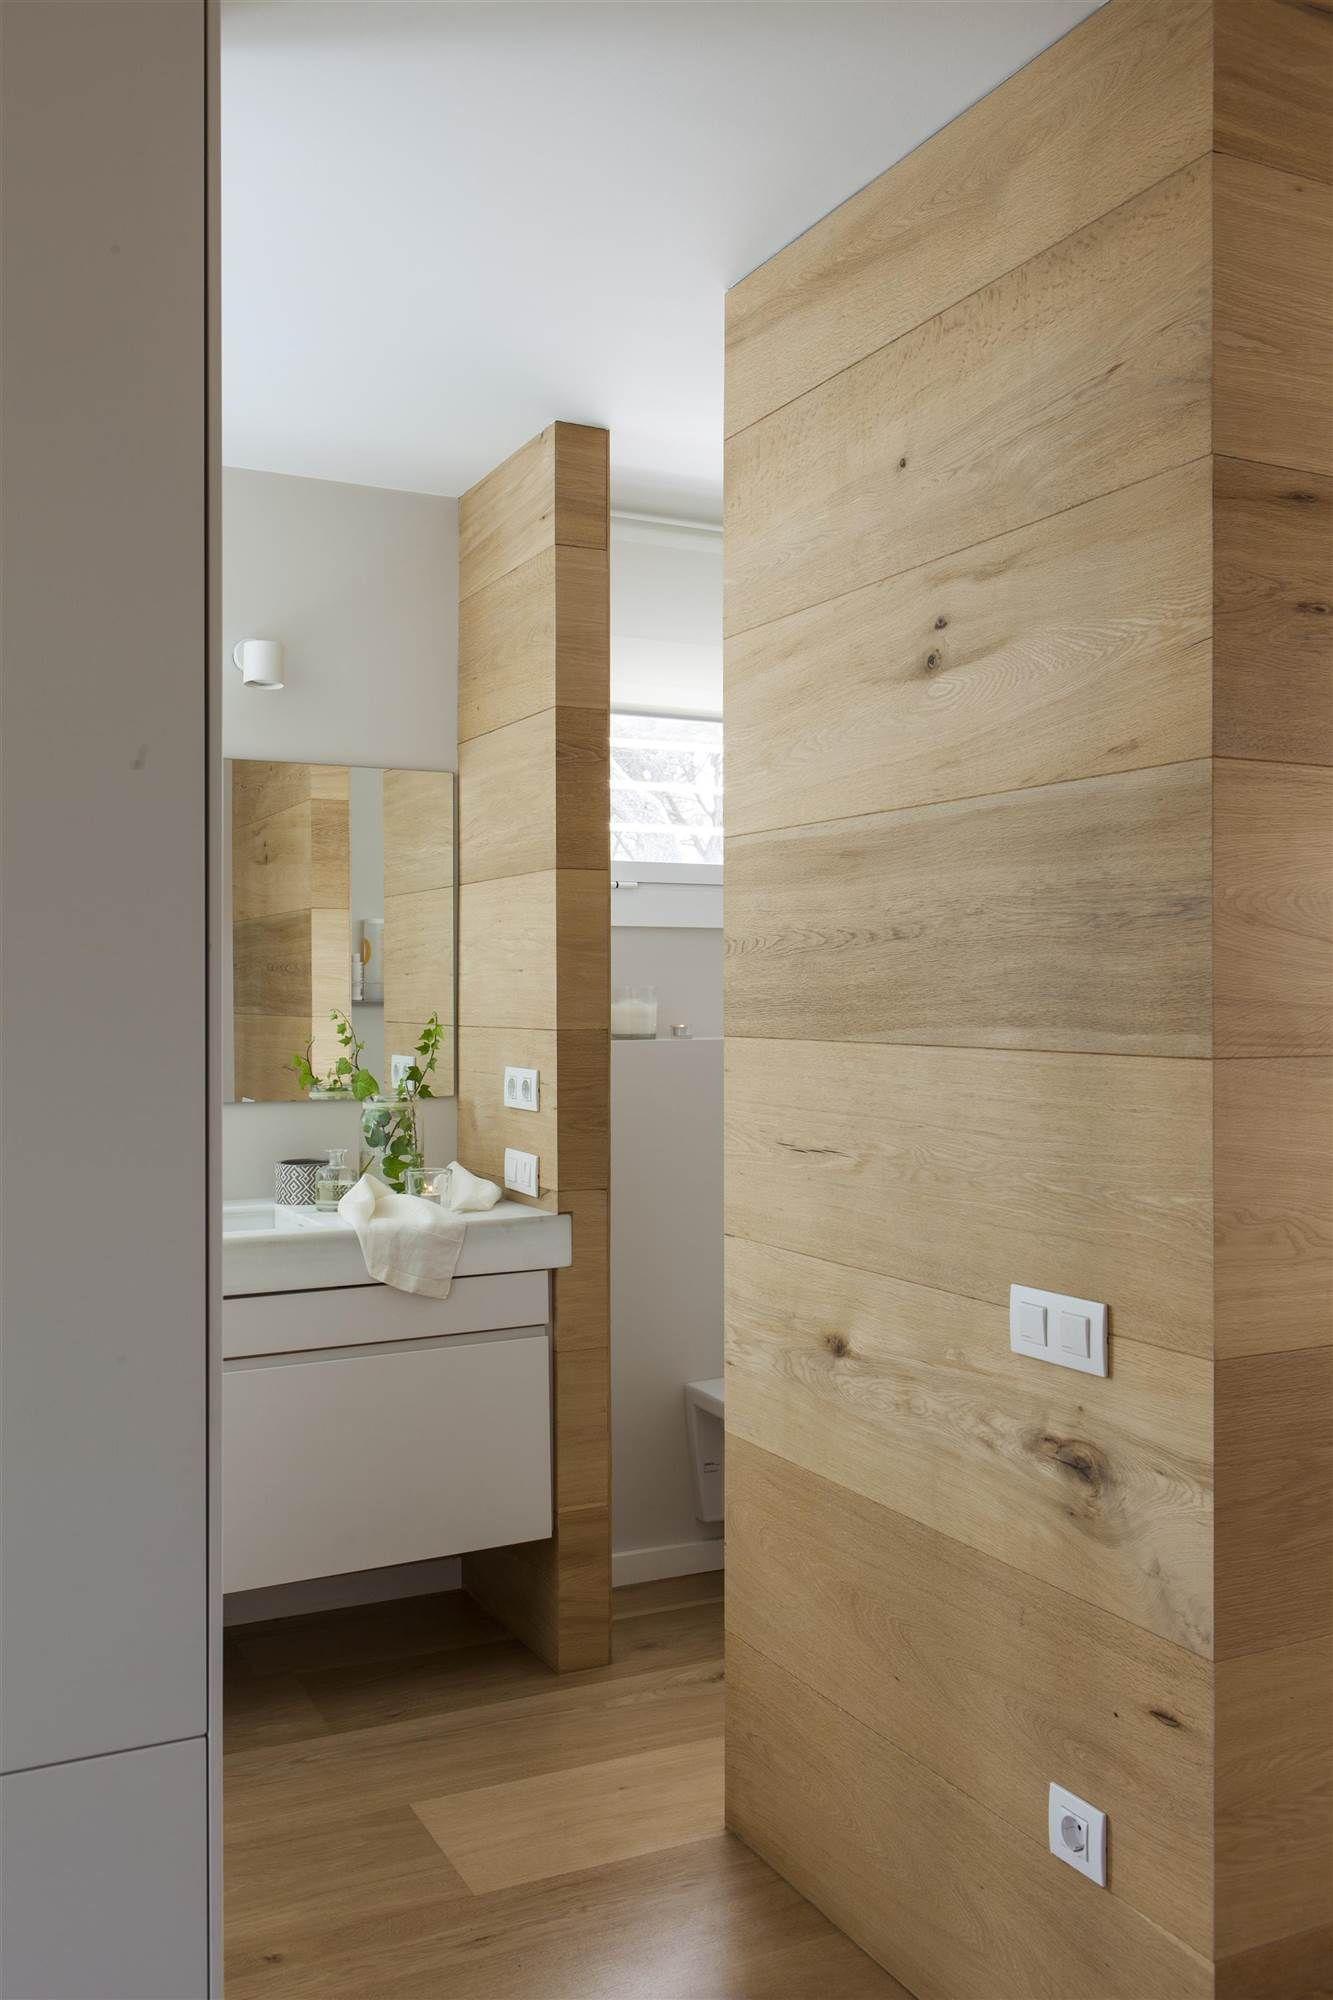 Paredes de madera y ba o blanco 00447118 o en 2018 ba o for Revestimiento de madera para banos